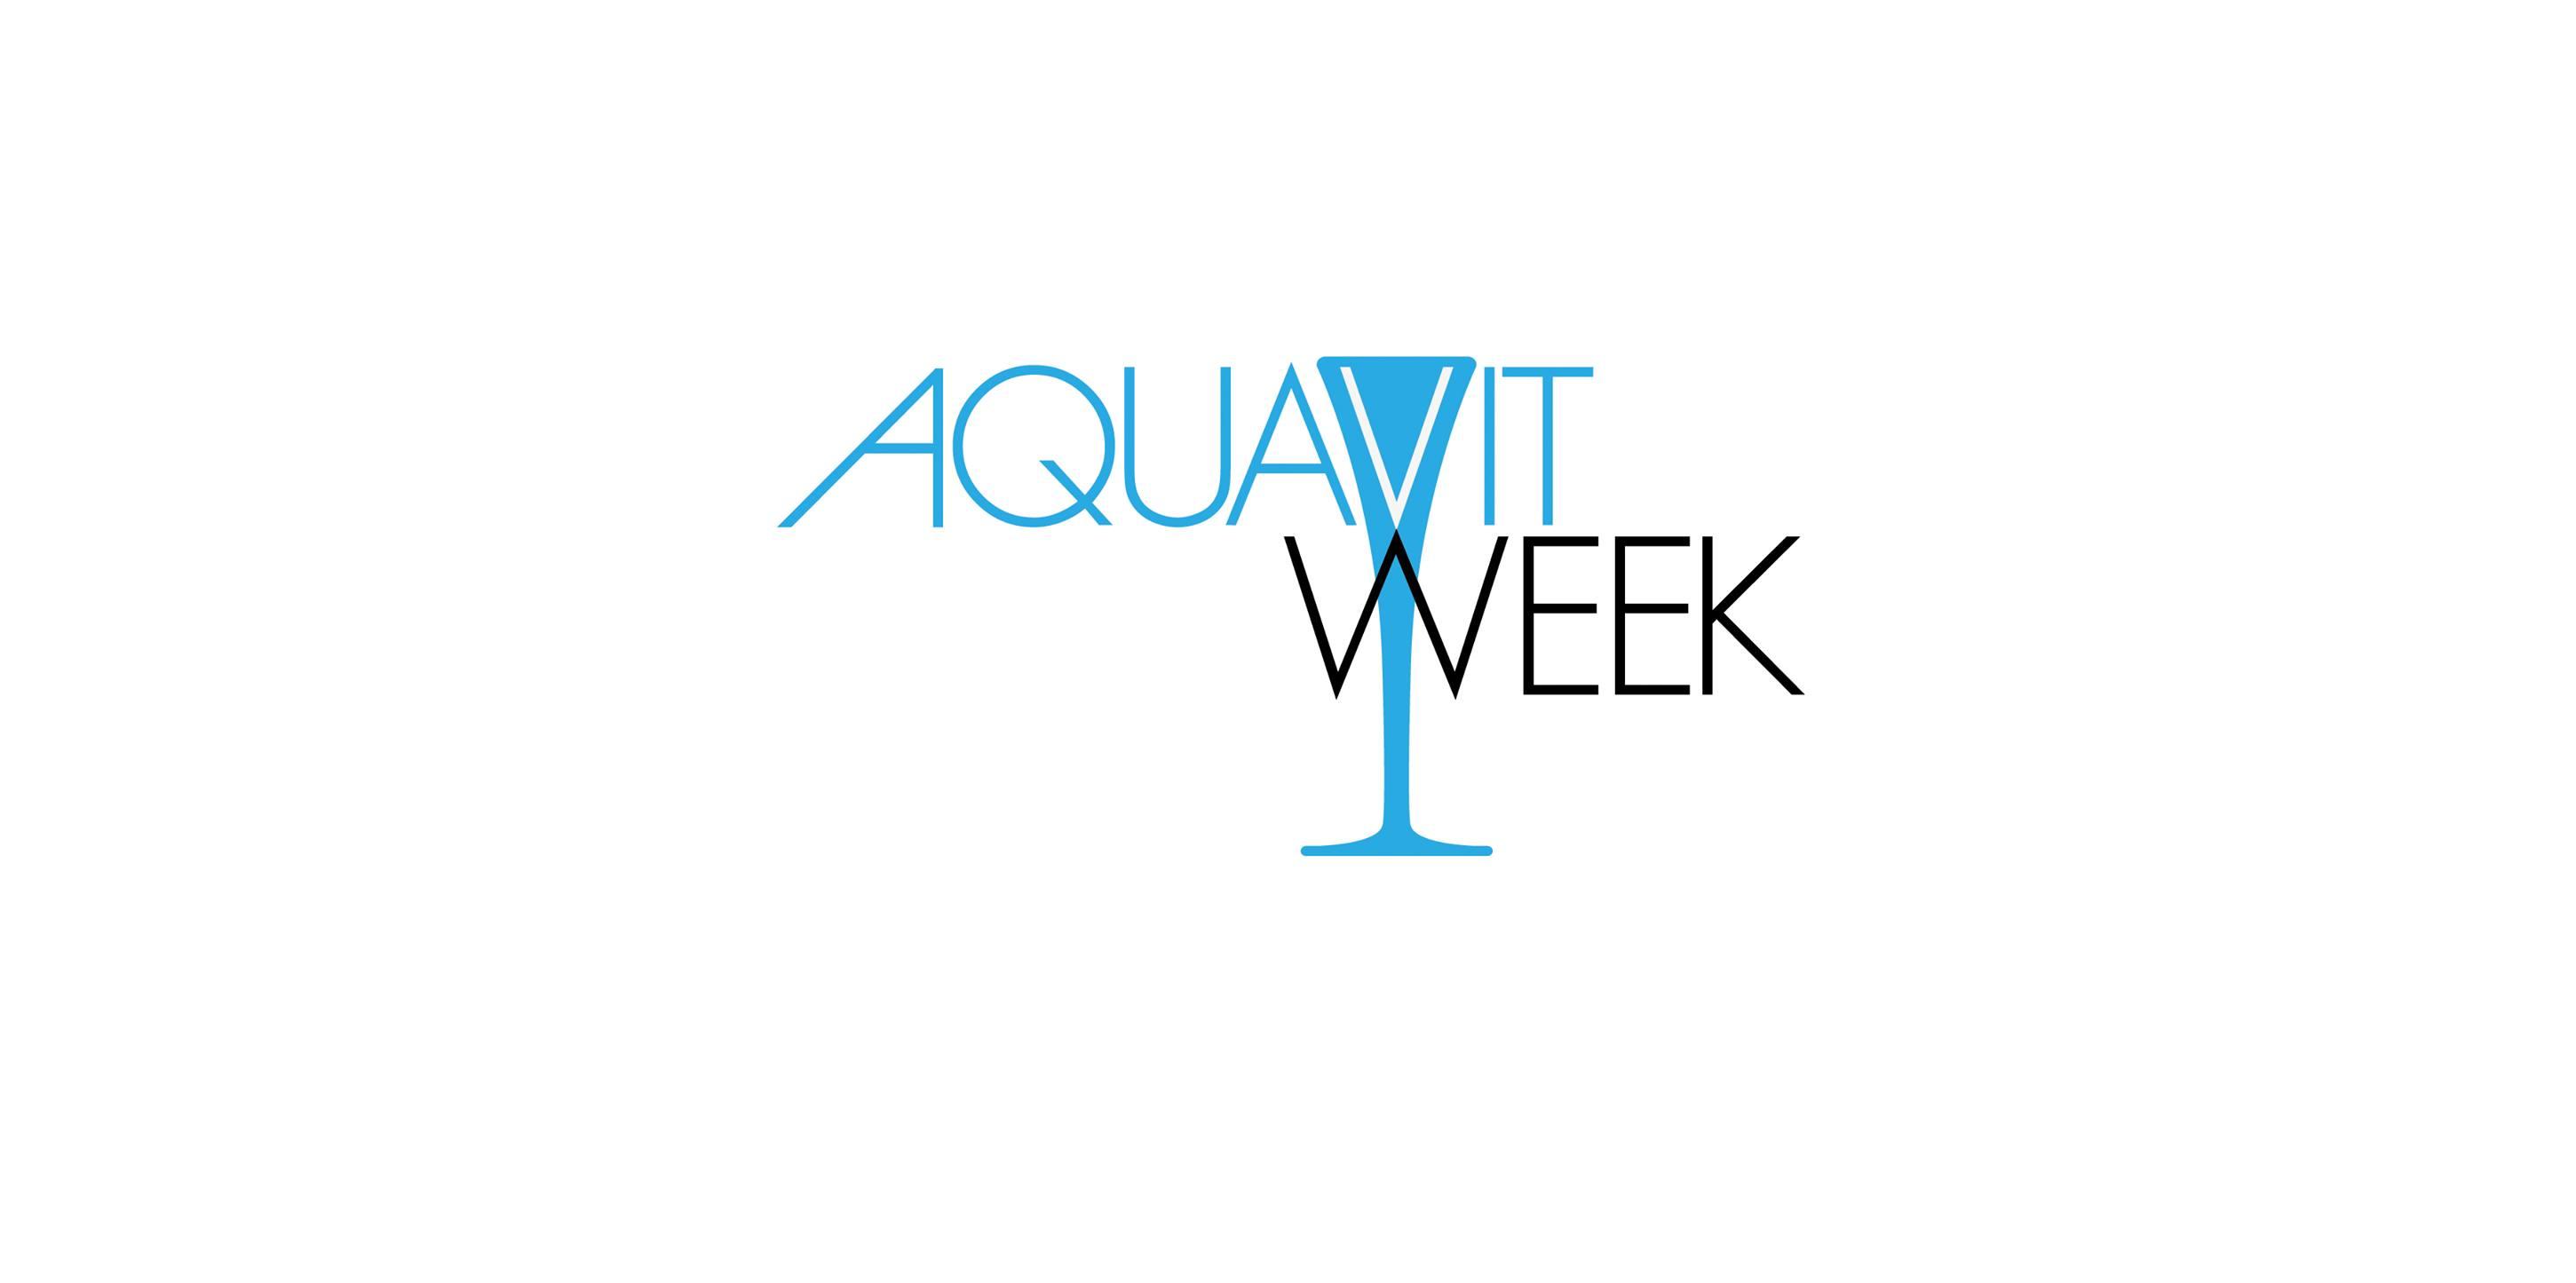 aquavit-week-banner-1